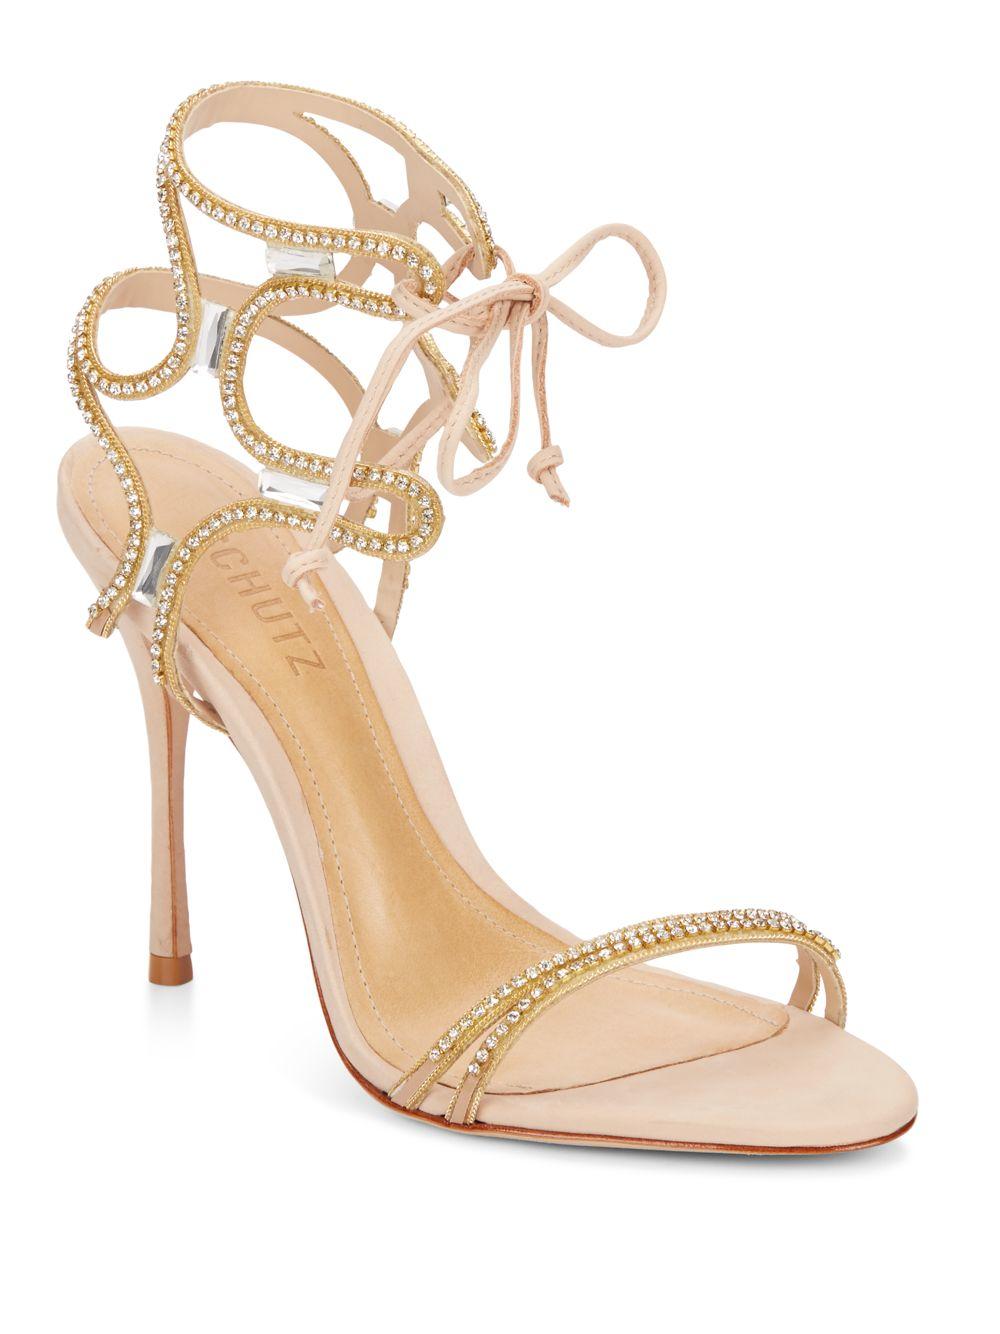 Schutz Cristen Tanino Metallic Embellished Crystal Single Sole Stiletto Sandals